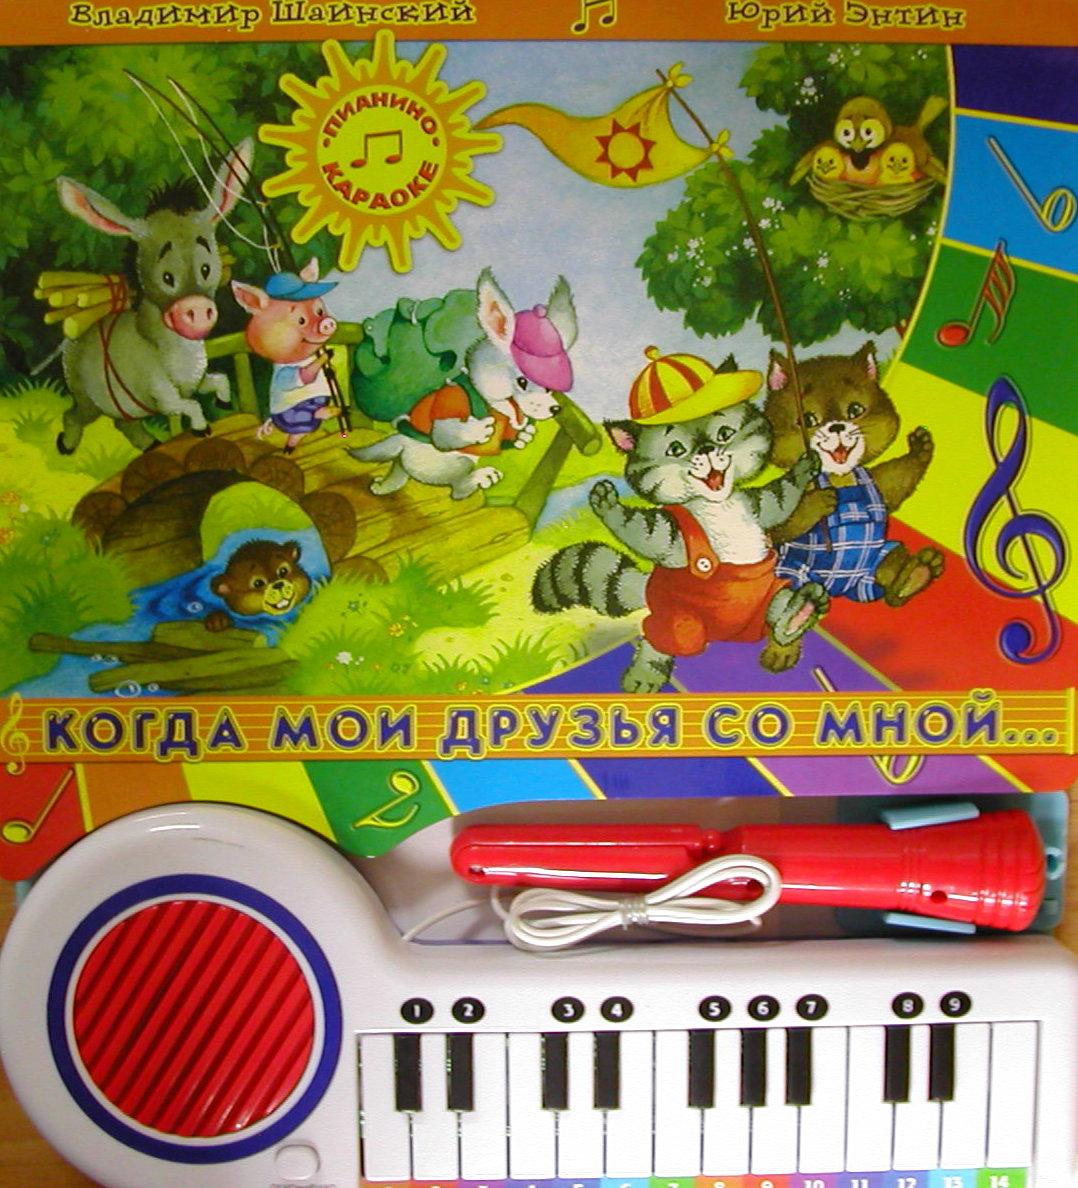 Пианино-караоке/Когда мои друзья со мной